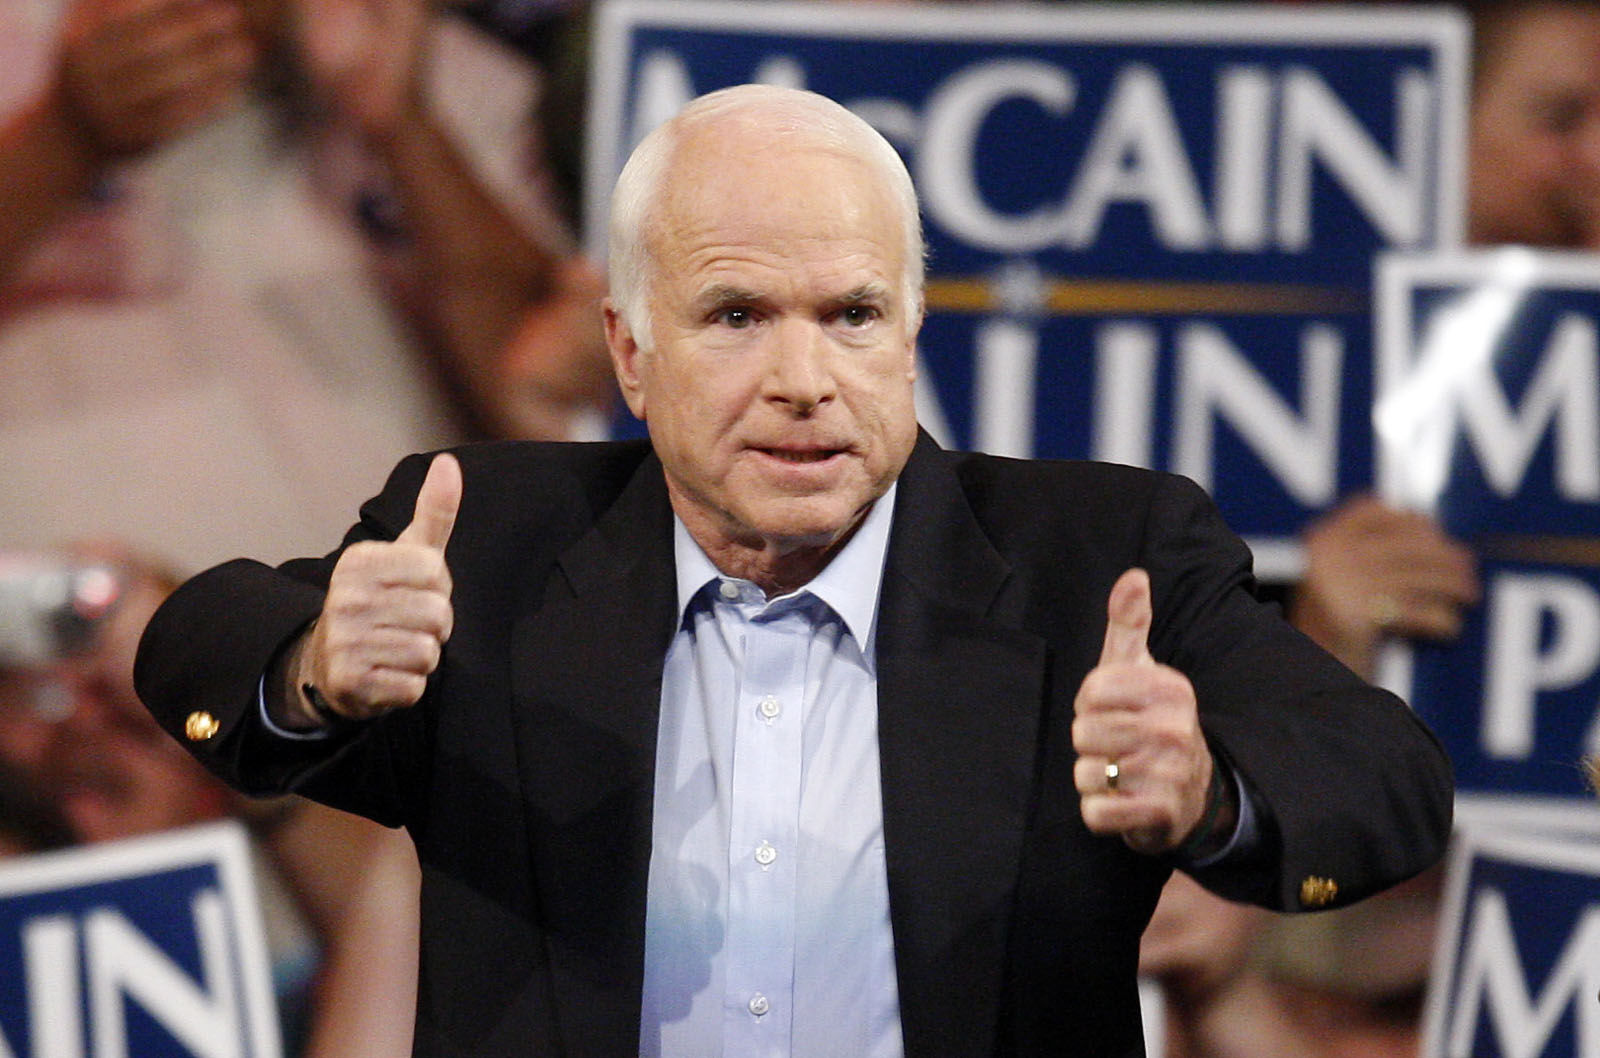 Republican presidential candidate Sen. John McCain, R-Ariz., speaks during a rally in Henderson, Nev. Monday, Nov. 3, 2008. (AP Photo/Isaac Brekken)